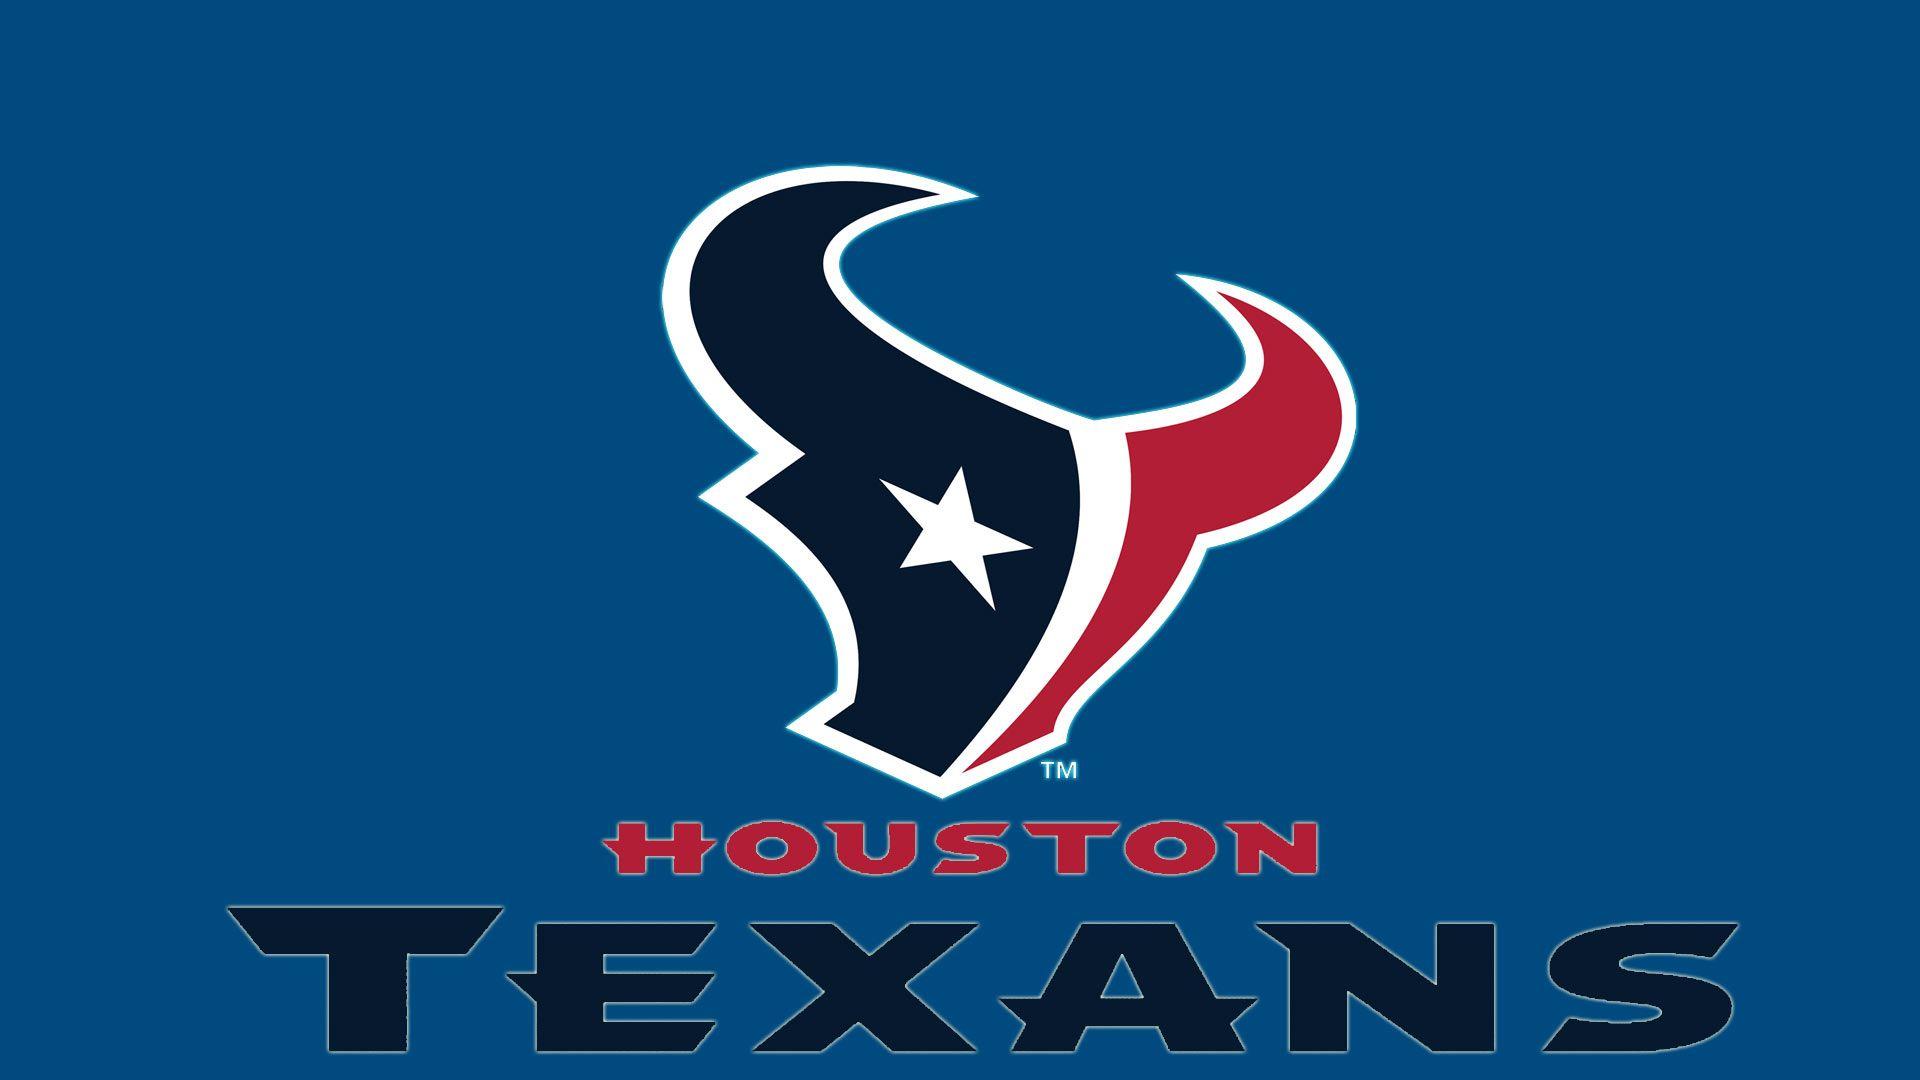 Logo clipart houston texans 2015 logo size Wallpapers 1080p